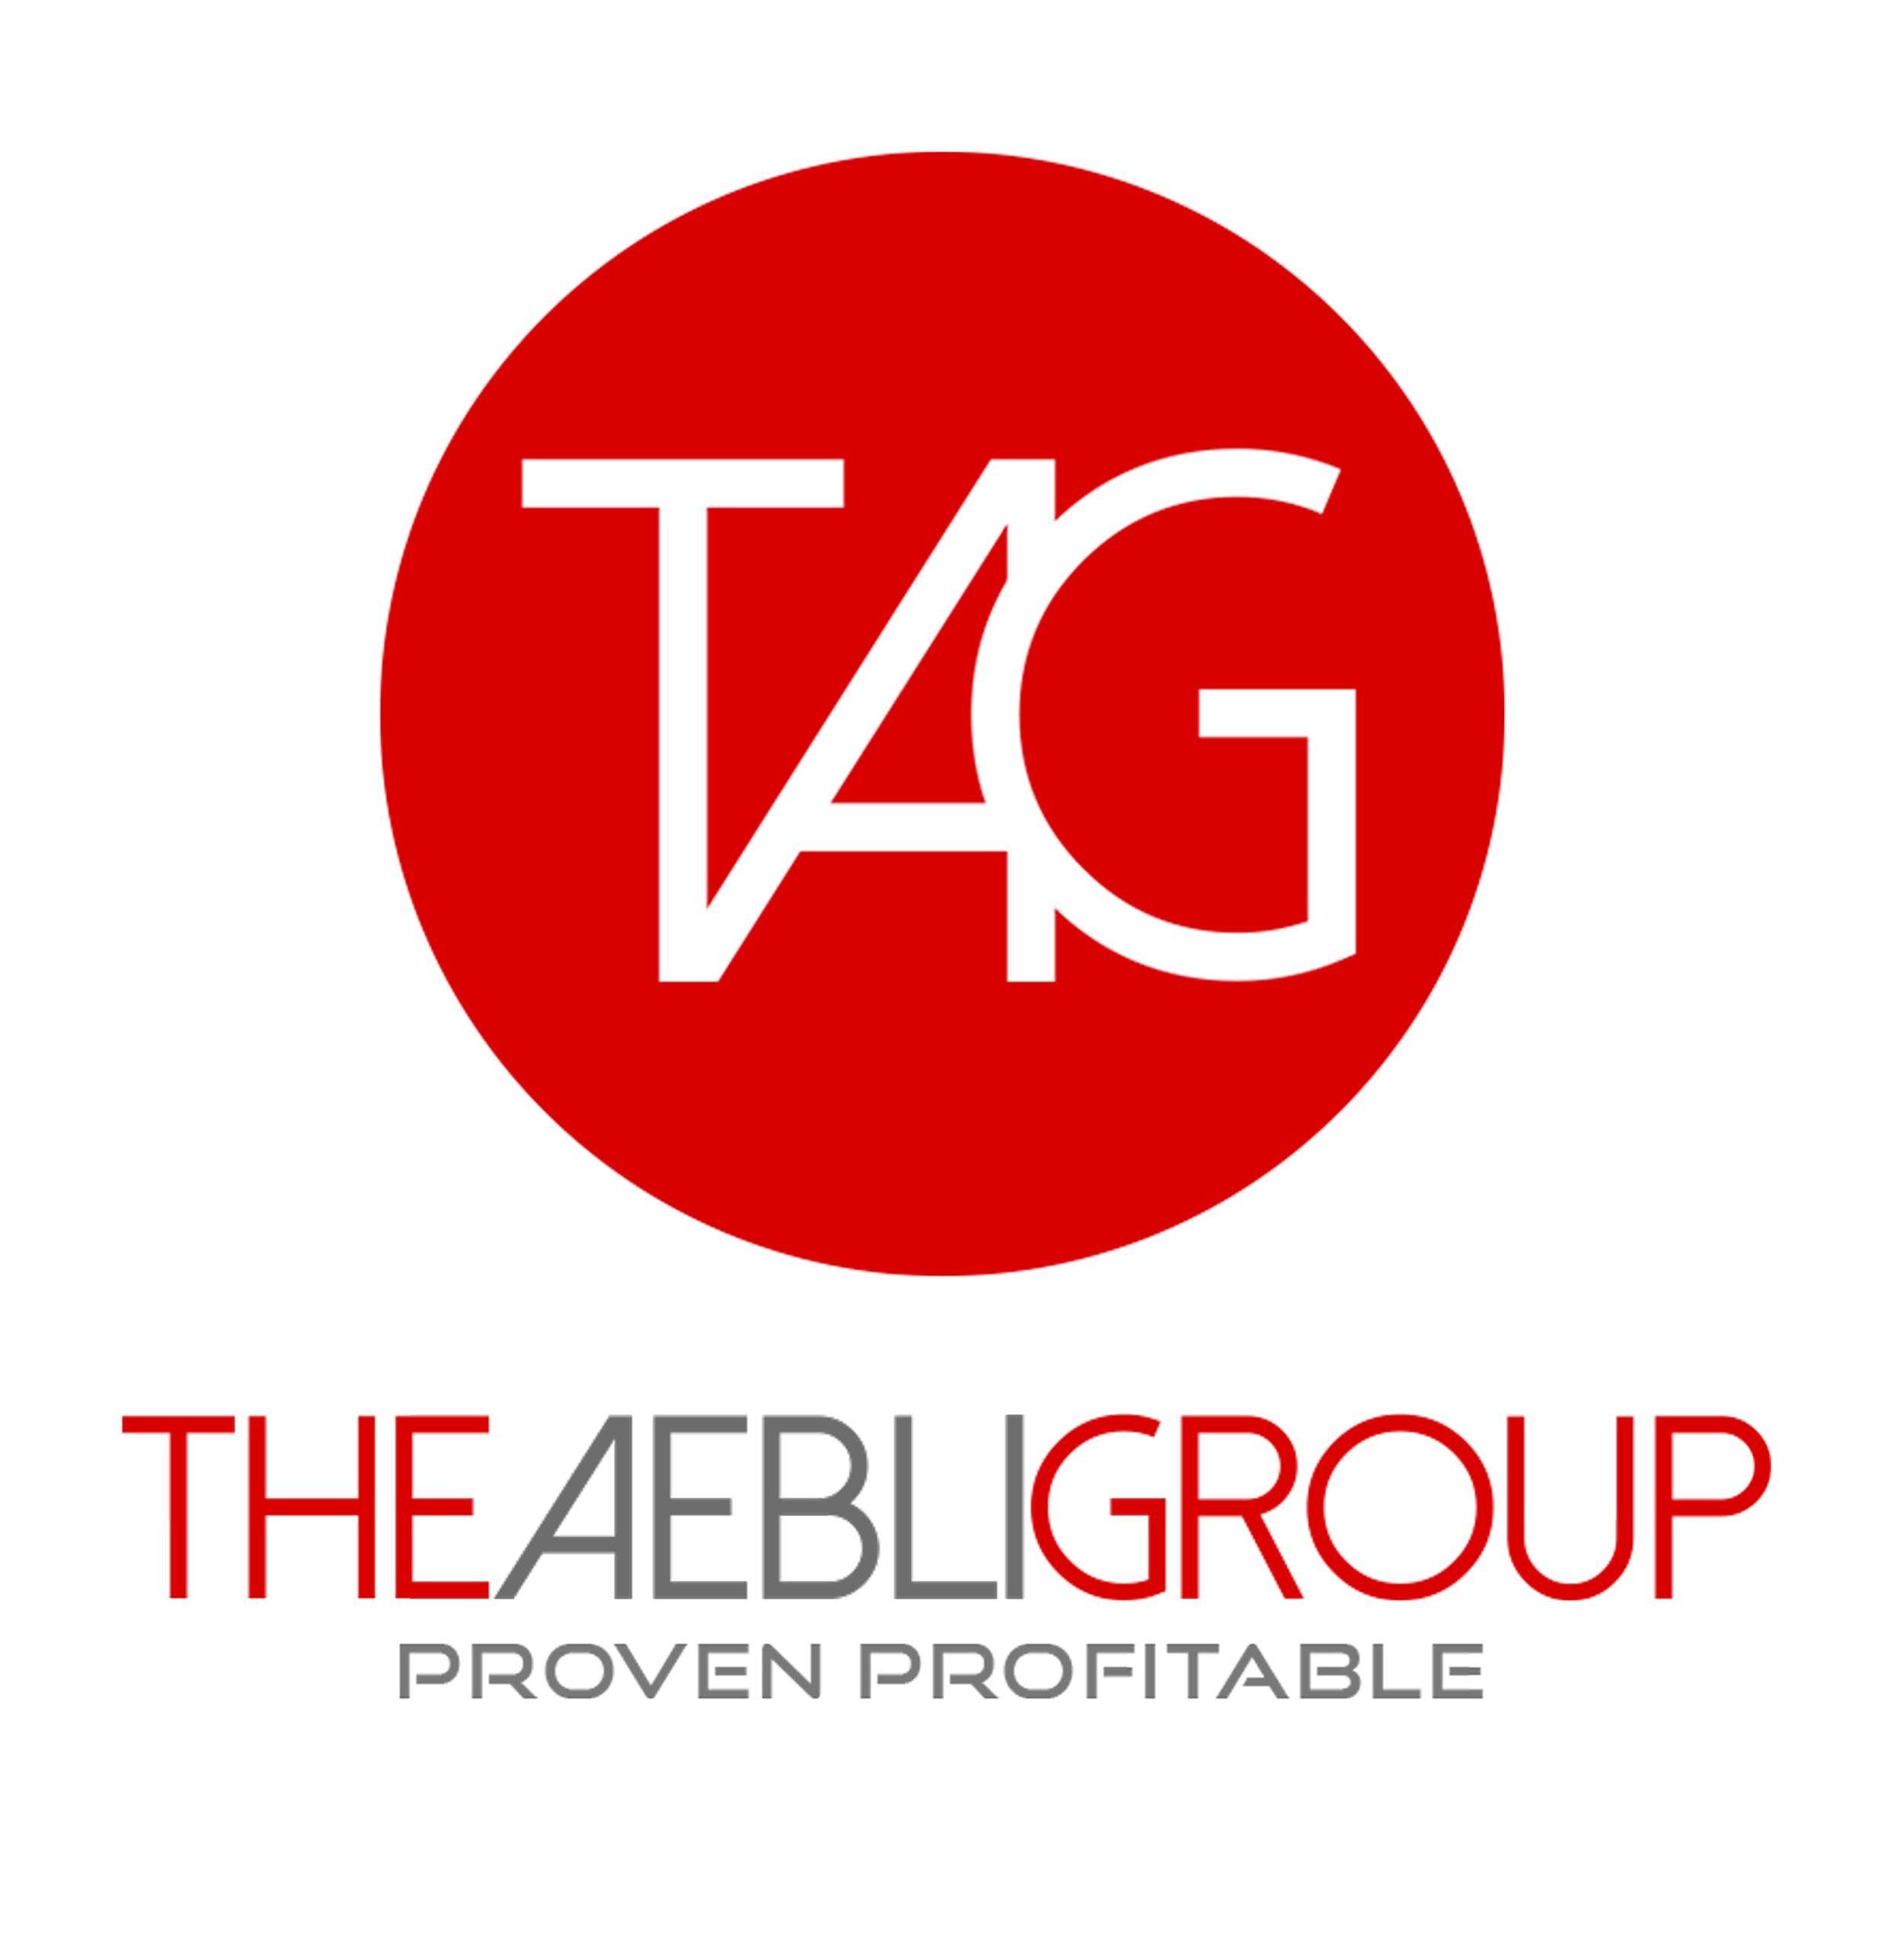 The Aebli Group business development agency